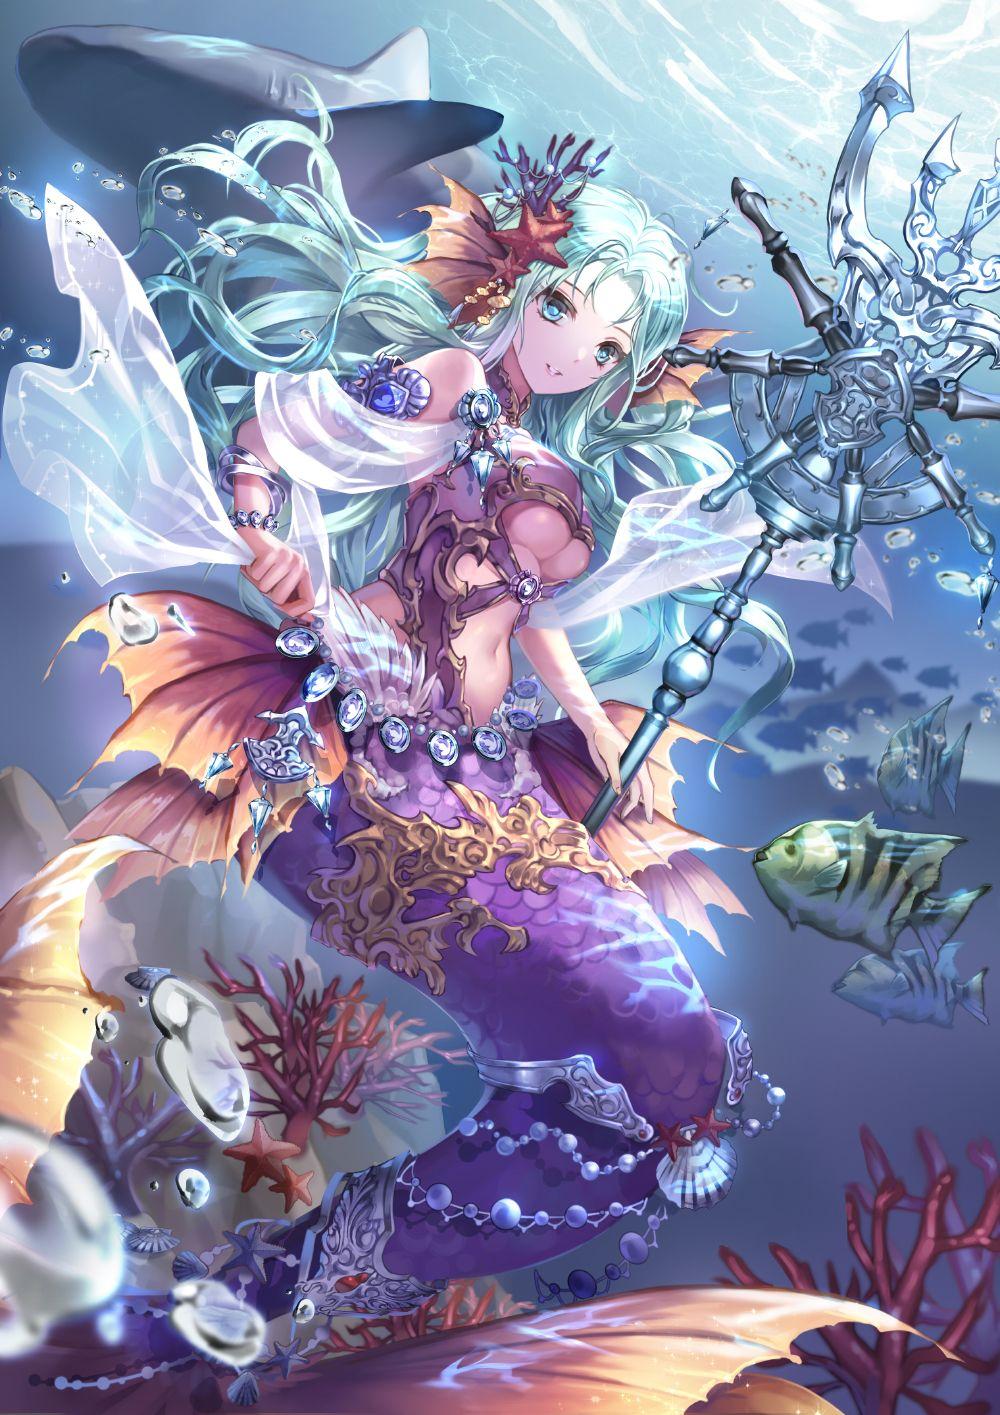 Shenteita Kai Fine Art Anime Mermaid Anime Art Fantasy Manga Mermaid